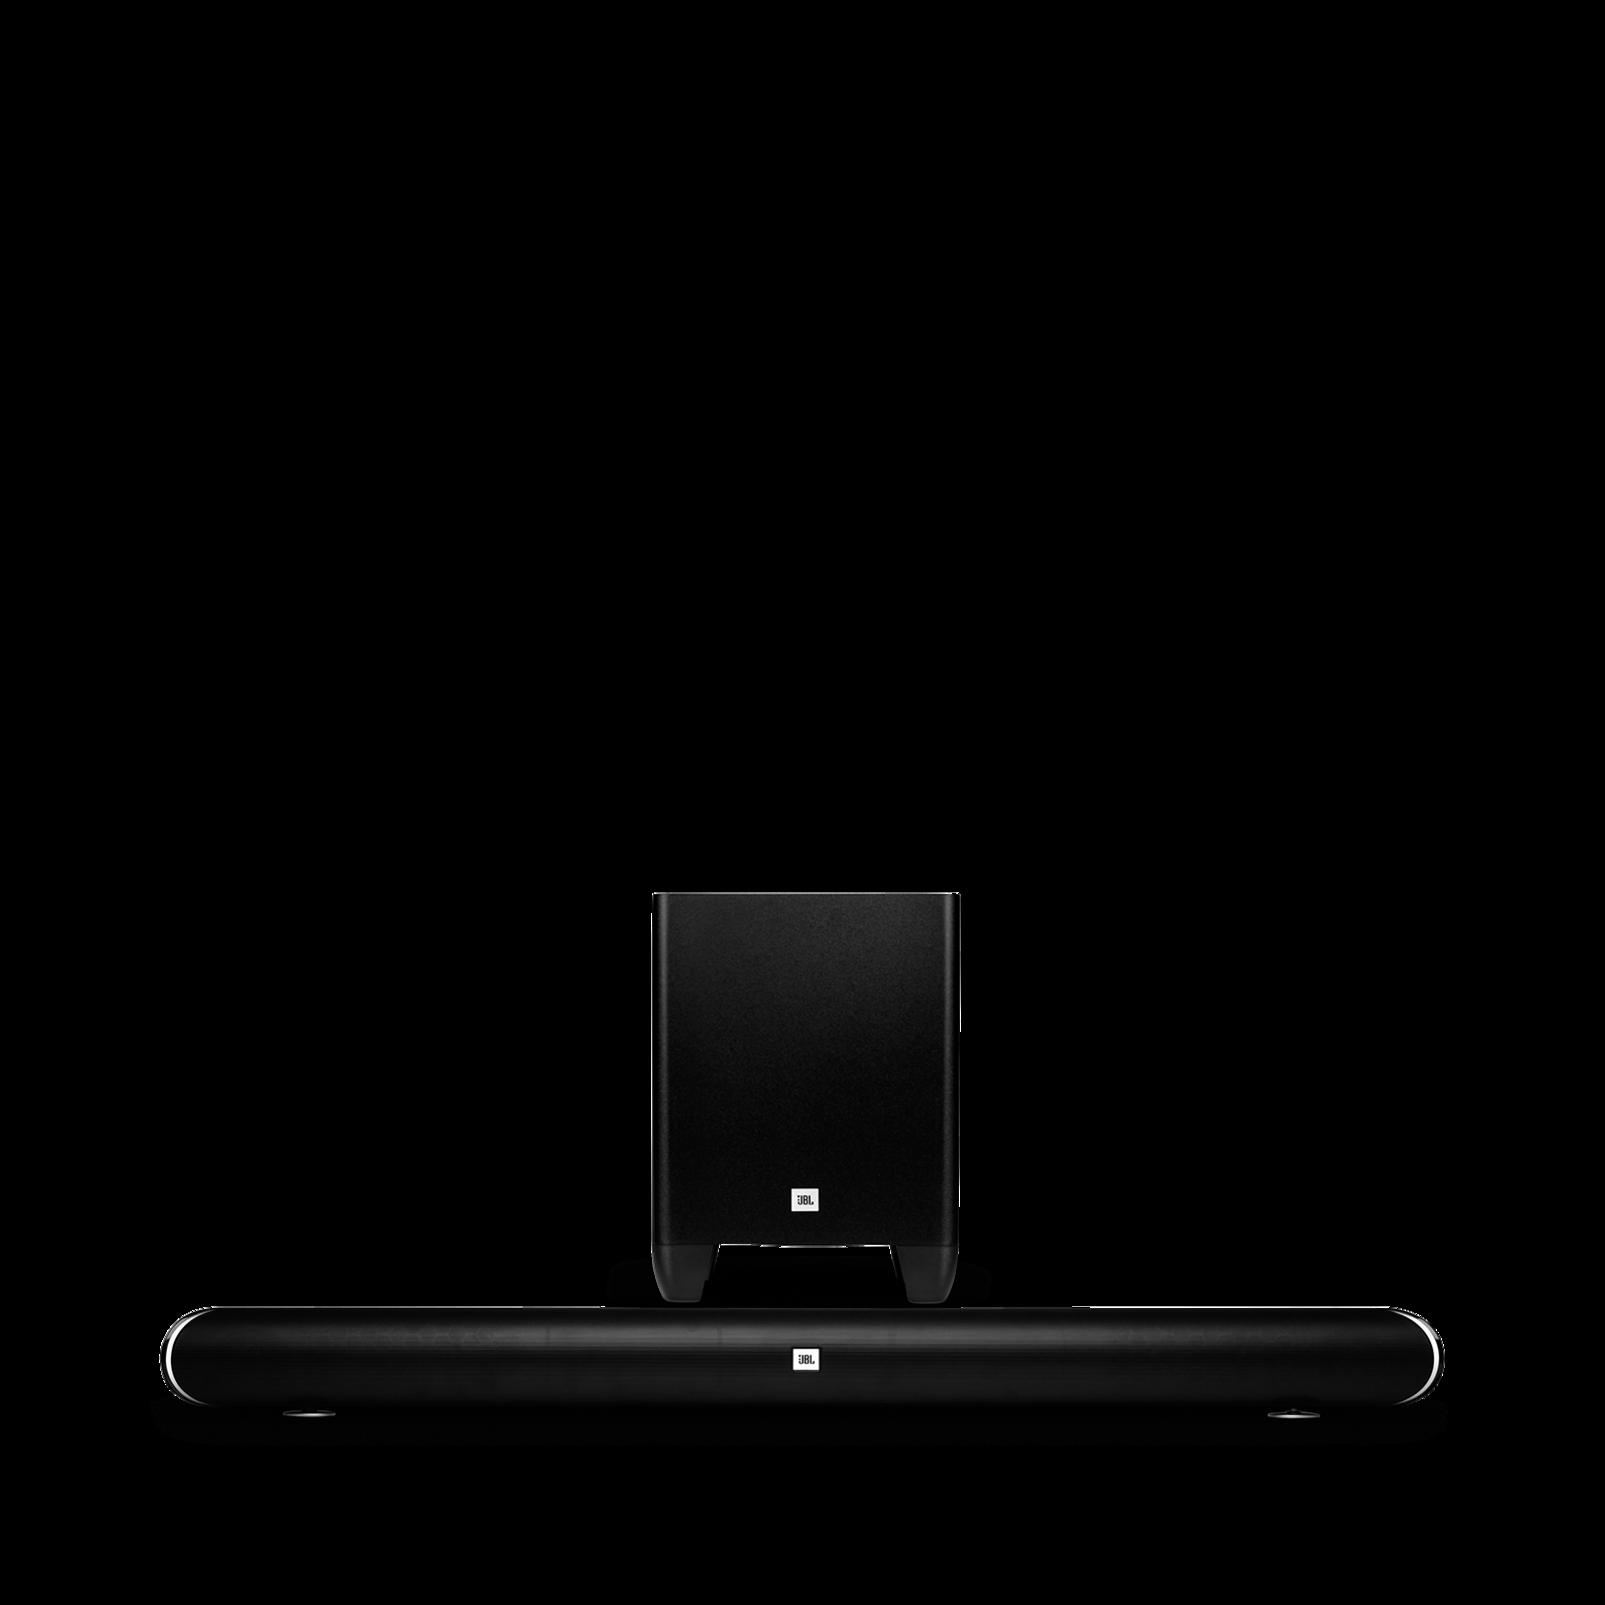 cinema sb350 2 1 bluetooth soundbar with wireless subwoofer. Black Bedroom Furniture Sets. Home Design Ideas